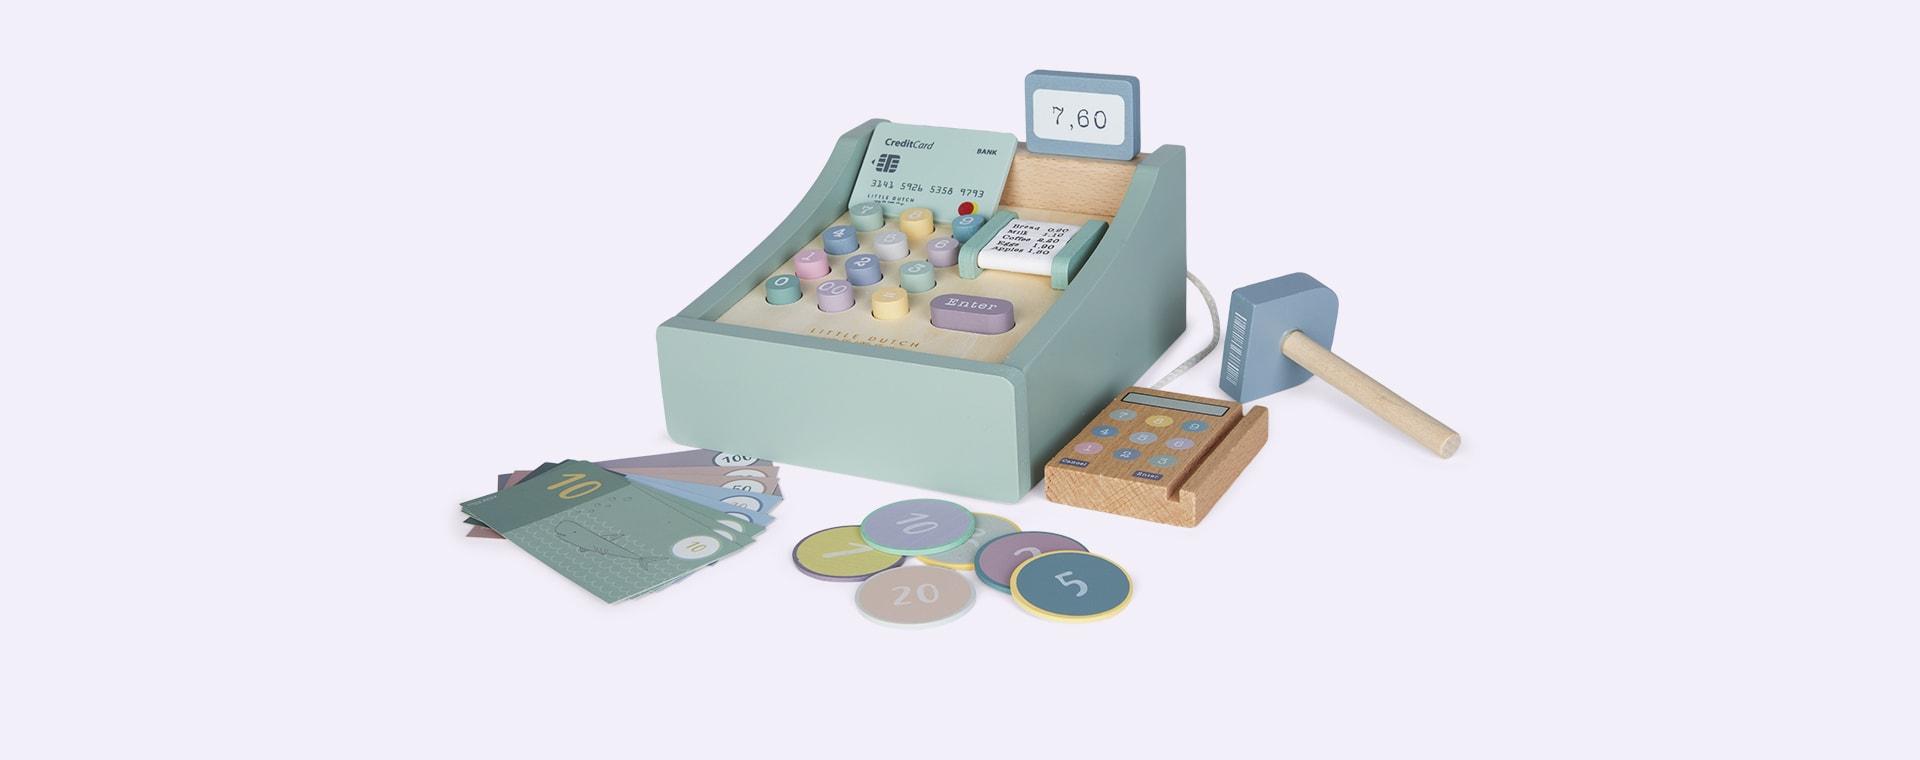 Mint Little Dutch Toy Cash Register With Scanner